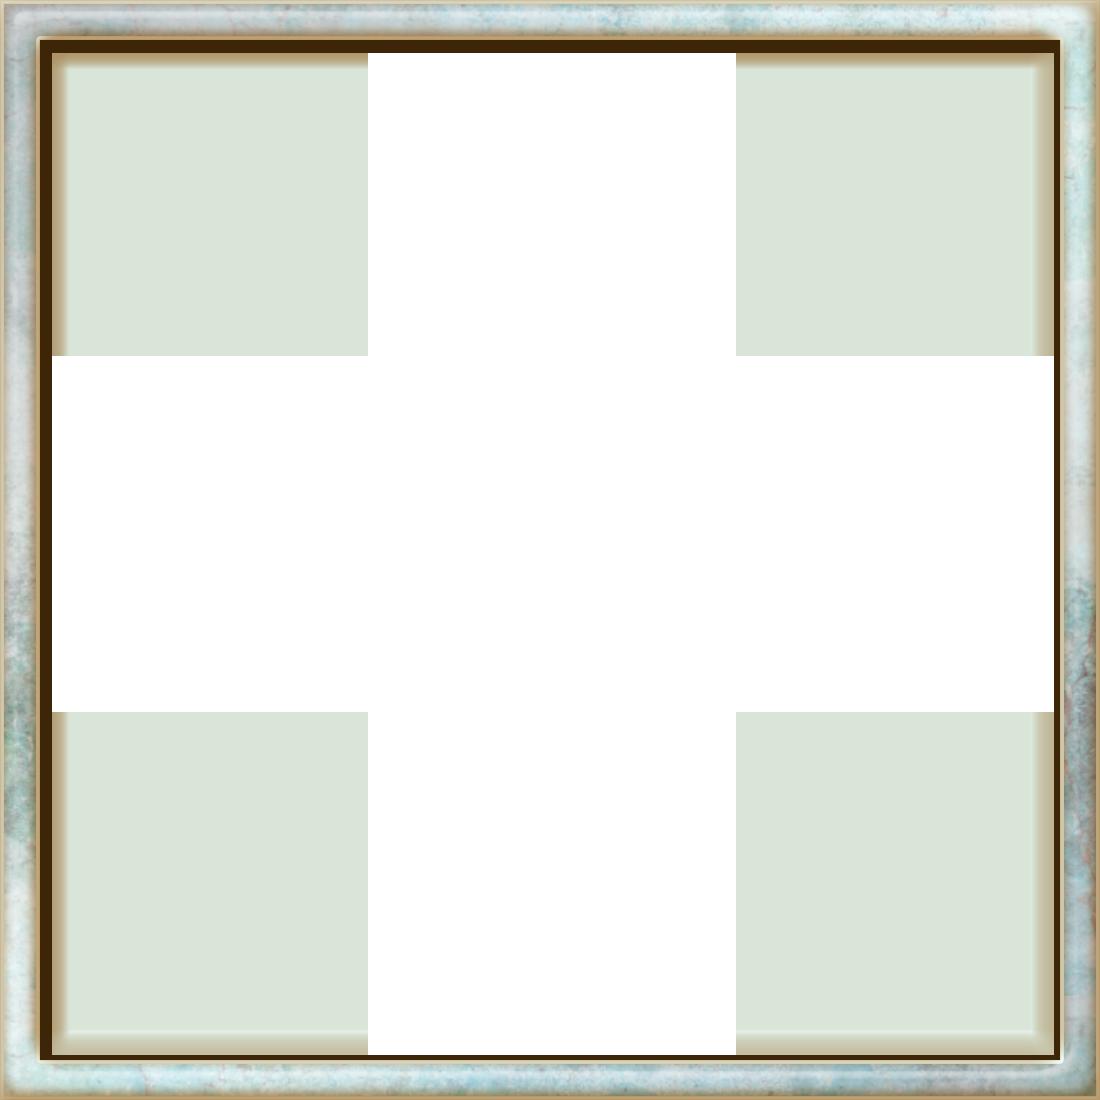 Giz Images: Square, post 20